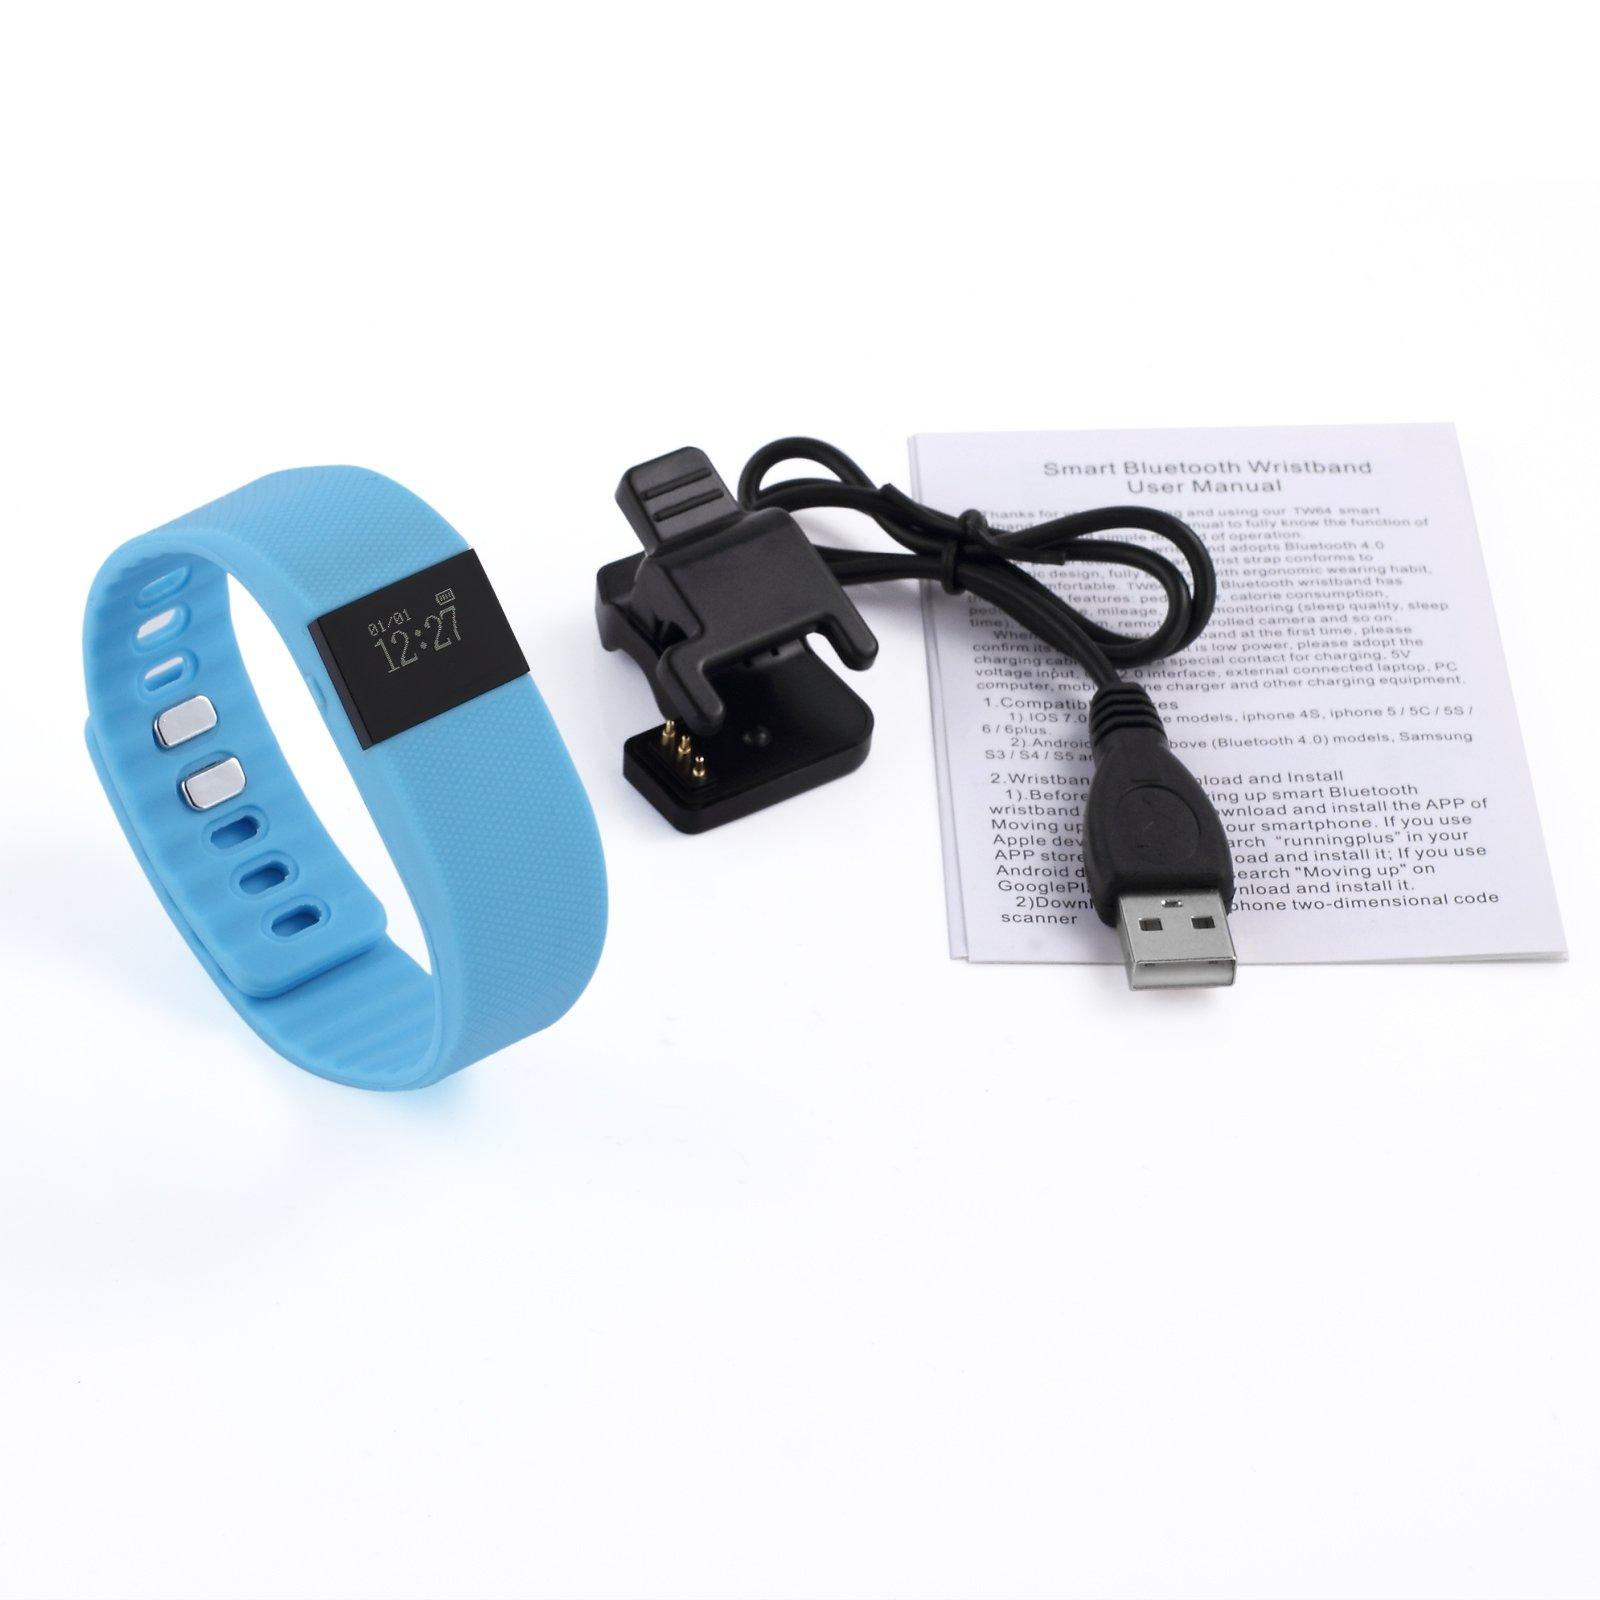 ESYNIC Fitness Activity Tracker Smart Pedometer Watch Sports Wrist Band TW64 Bluetooth